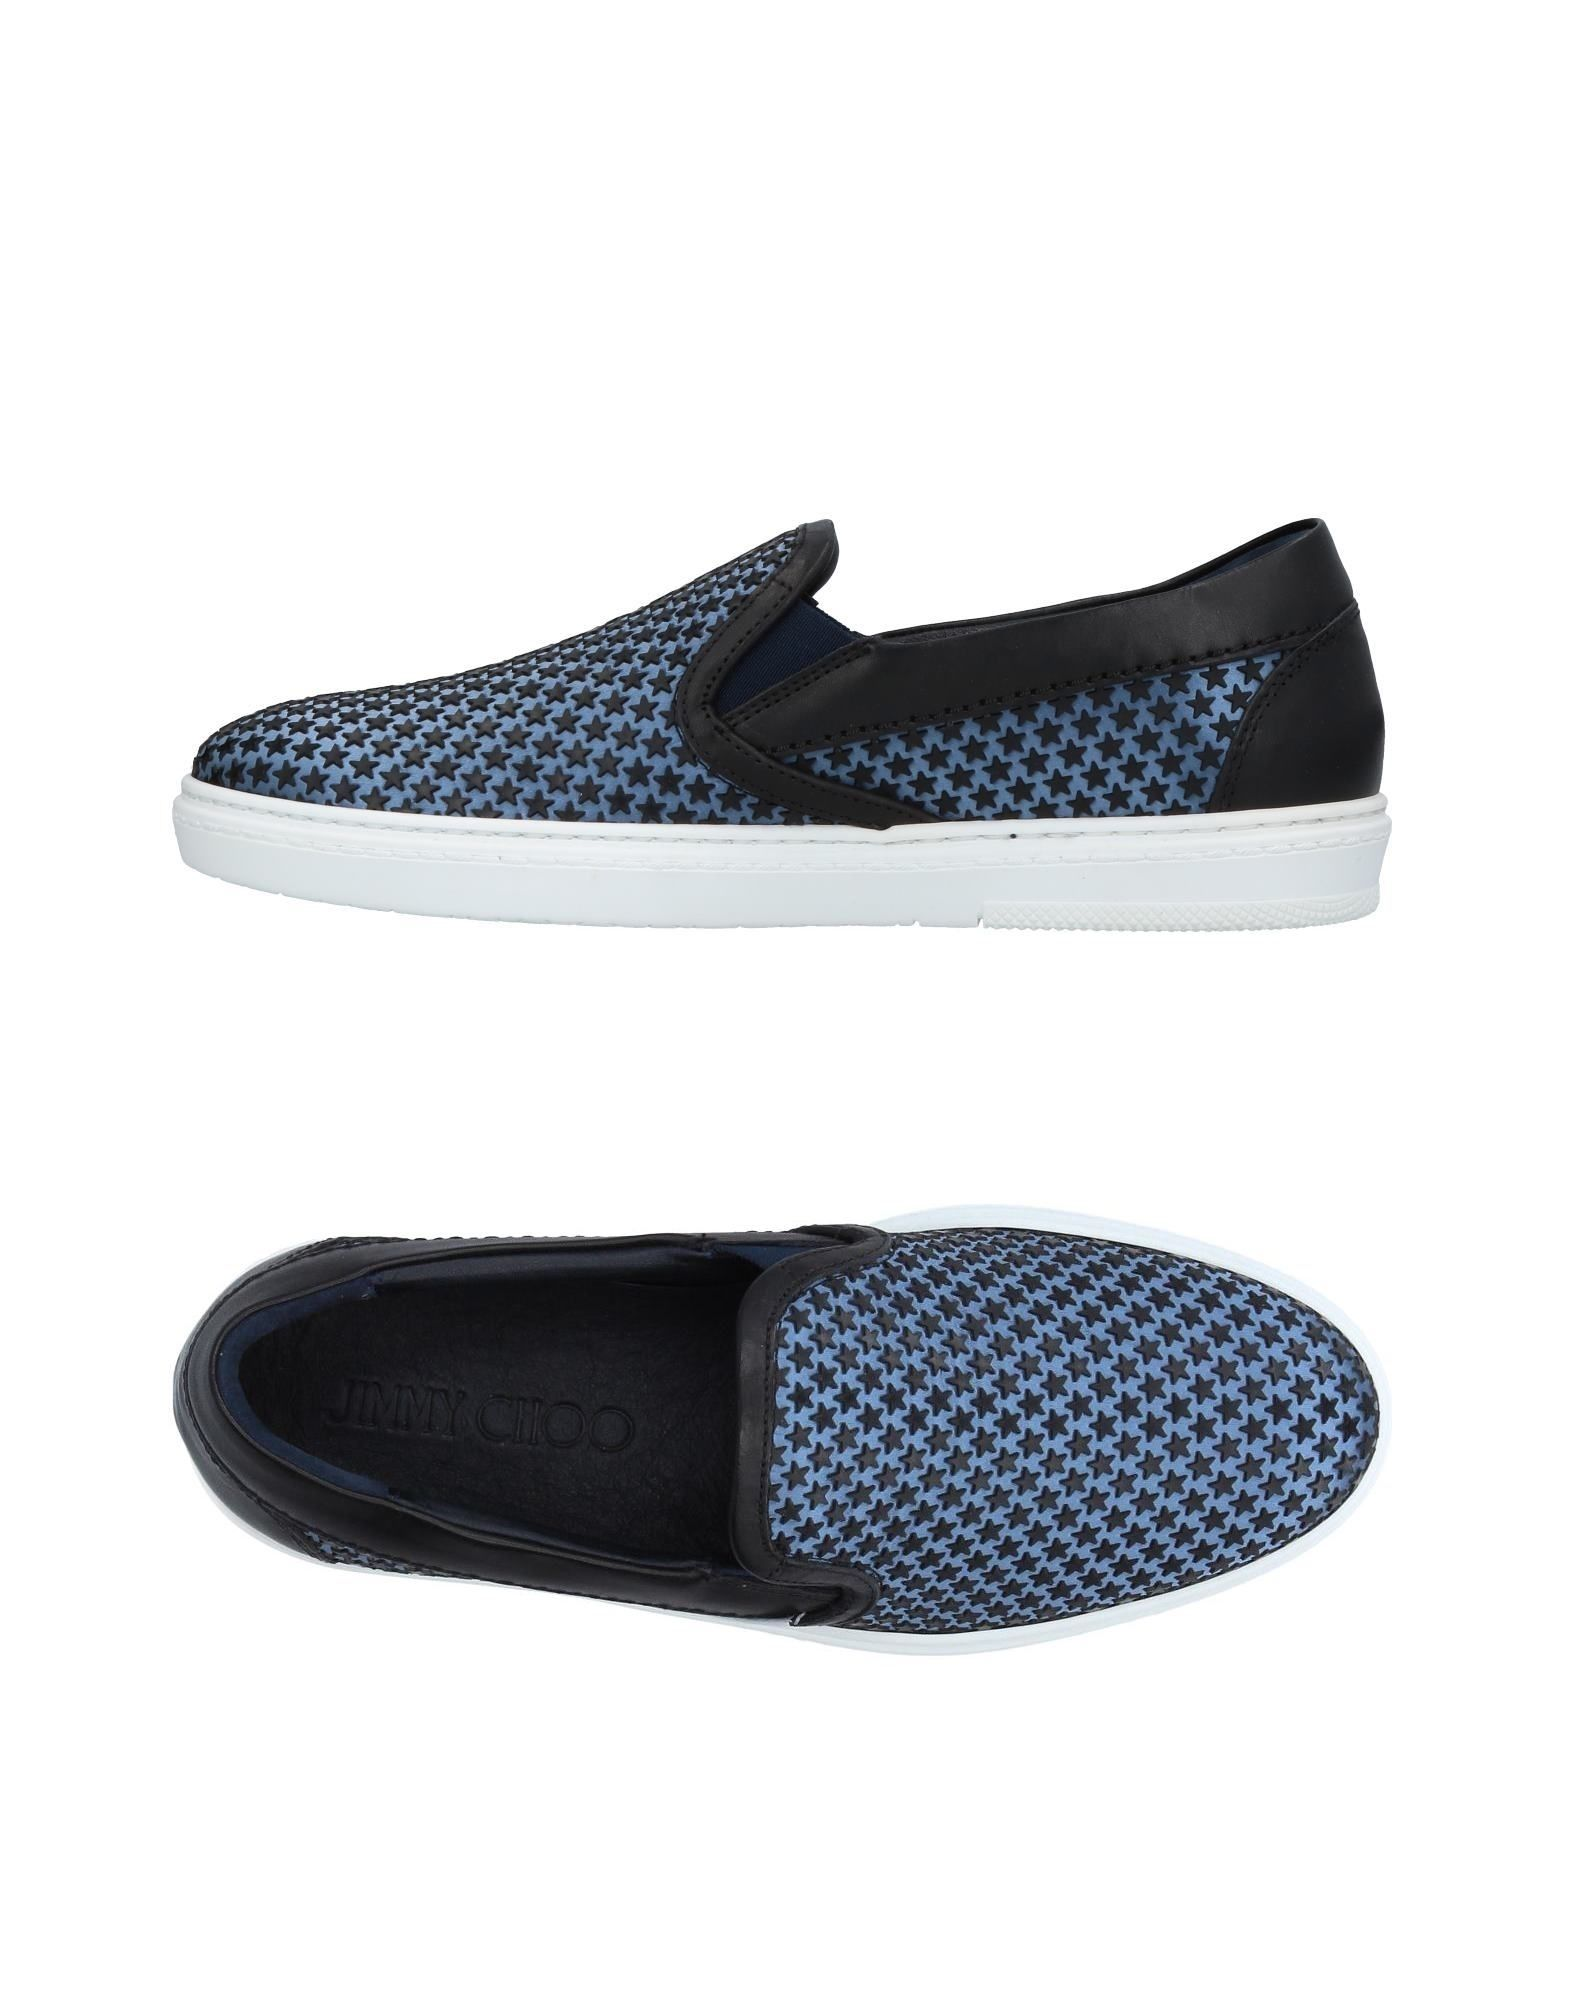 Jimmy Choo Sneakers Herren  11364853FP Gute Qualität beliebte Schuhe